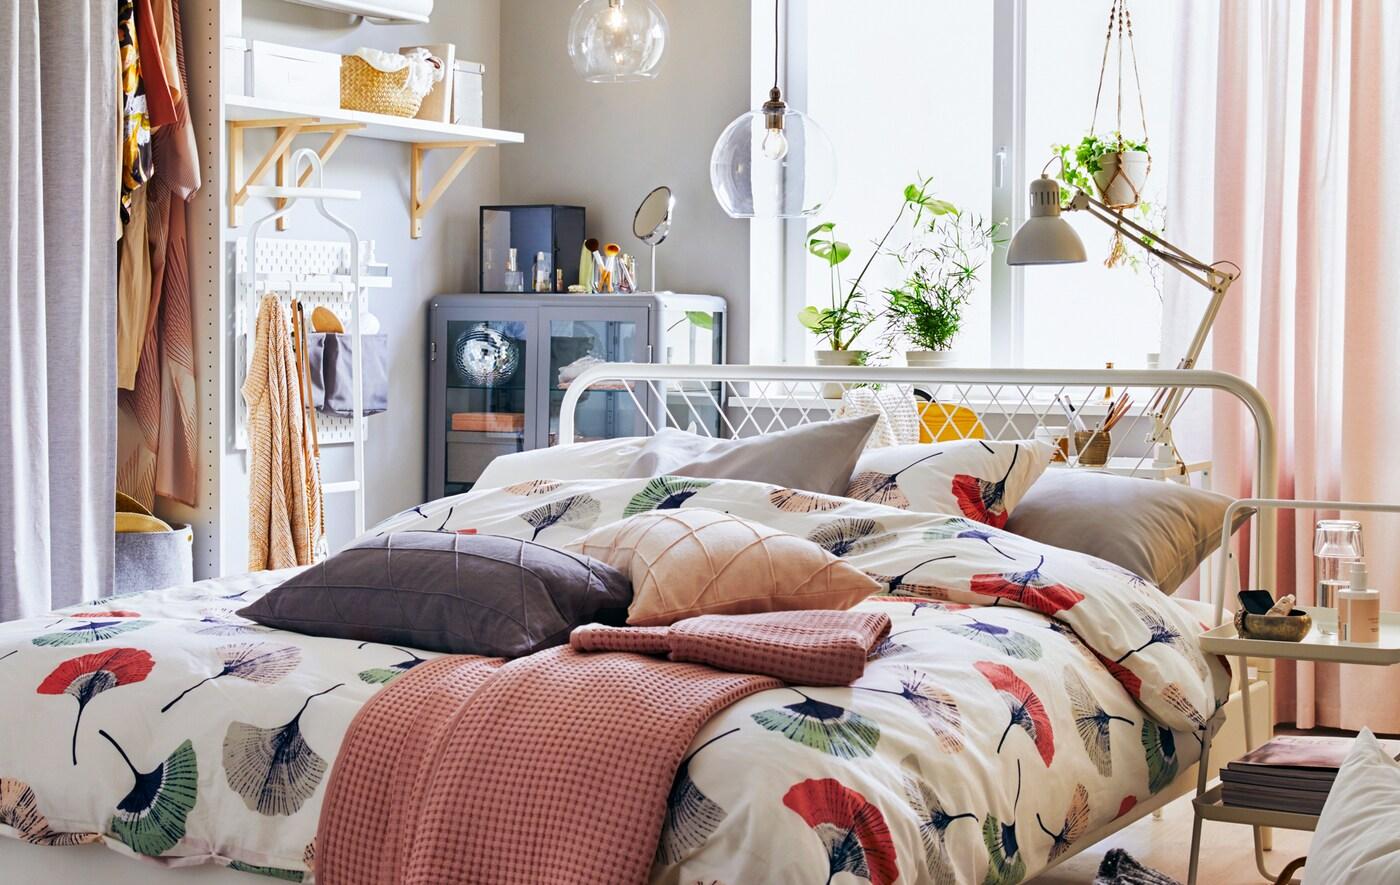 Krevet ukrašen cvetnom krevetninom u sredini prostorije s rešenjima za odlaganje i policama duž zidova.